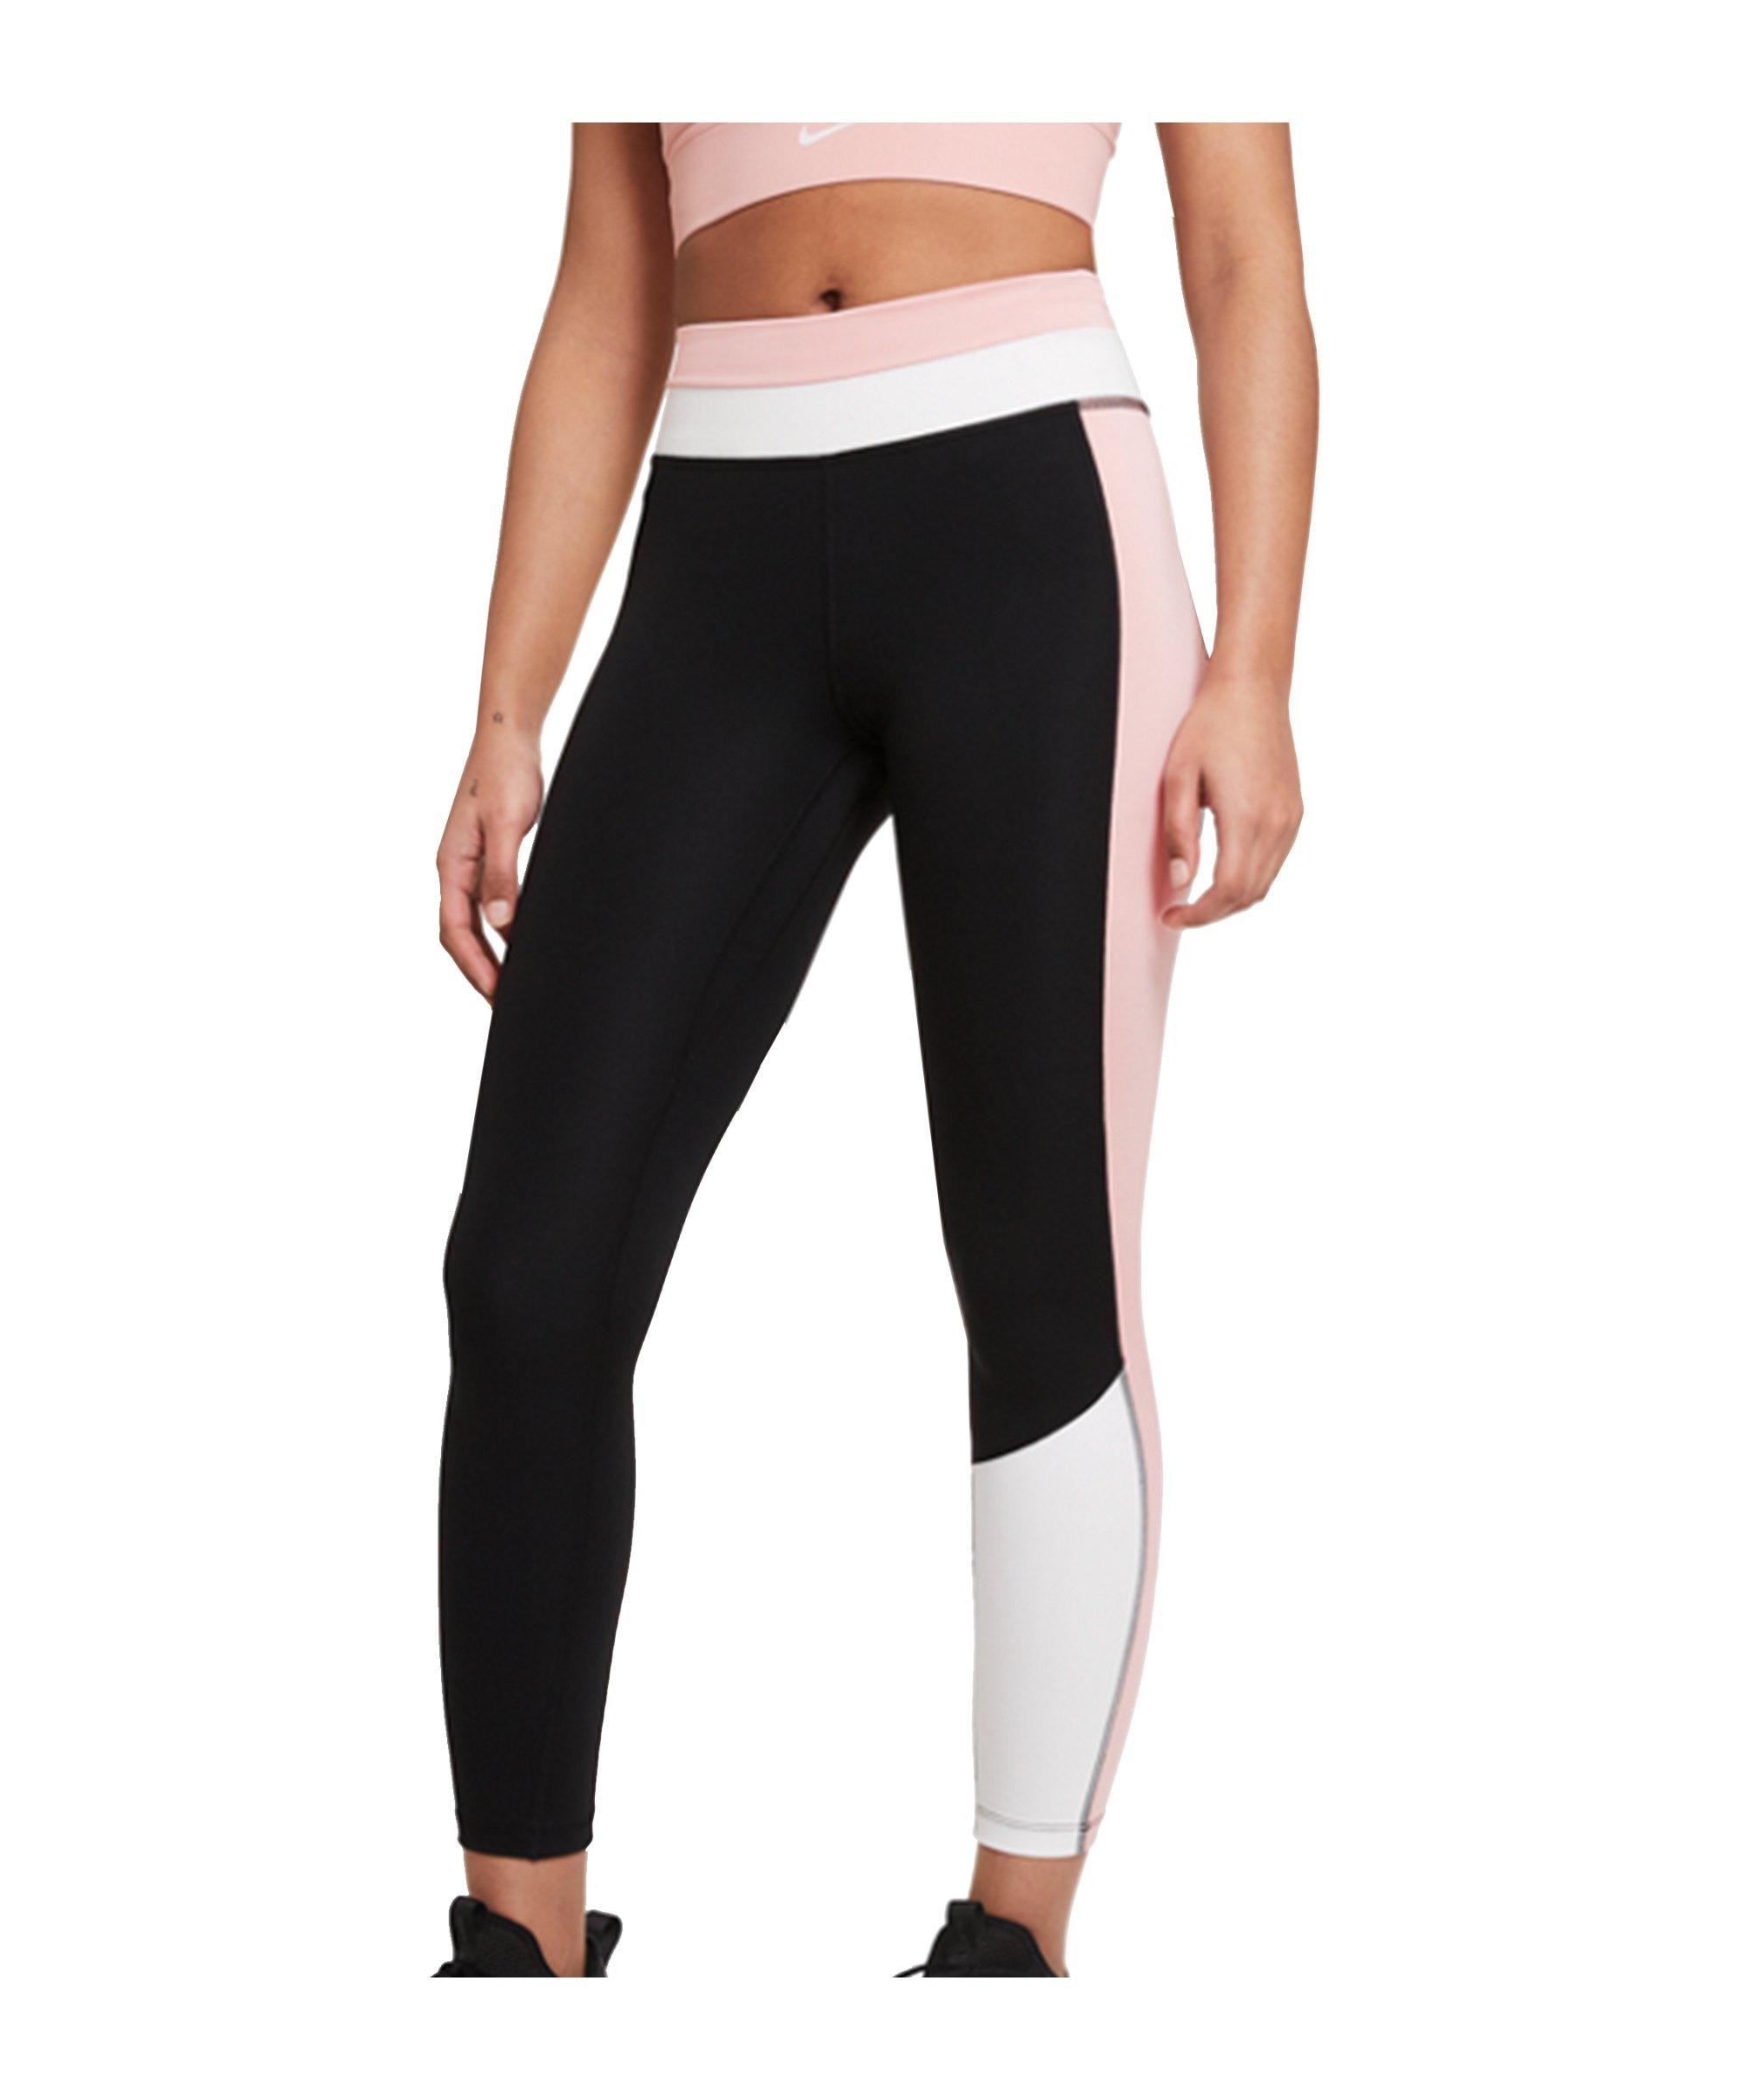 Nike One 7/8 CLRBLK Leggings Training Damen F010 - schwarz